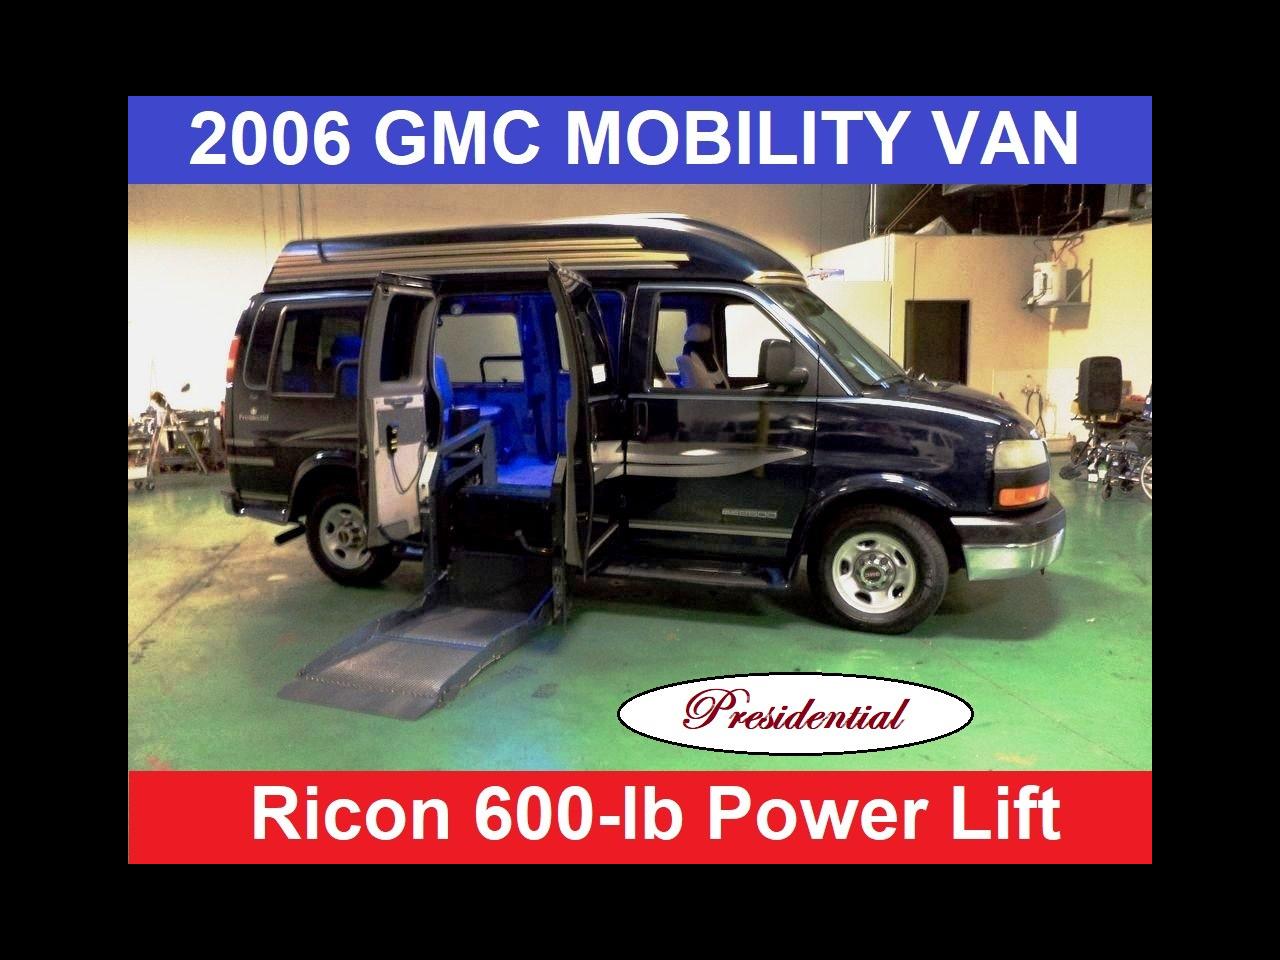 2006 GMC Savana Presidential Wheelchair Handicap Conversion Van